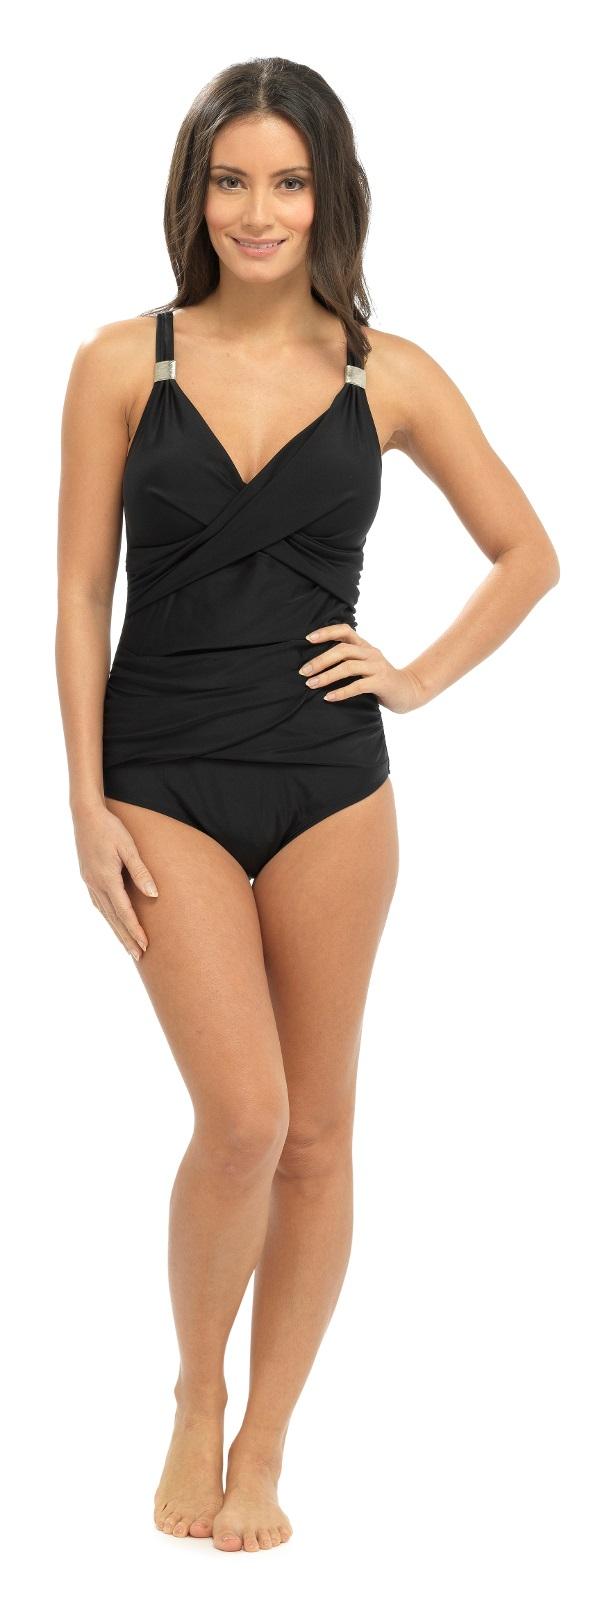 e5e18634d3 Womens Support Control Swimming Costume Ladies Swimsuit Swimwear ...